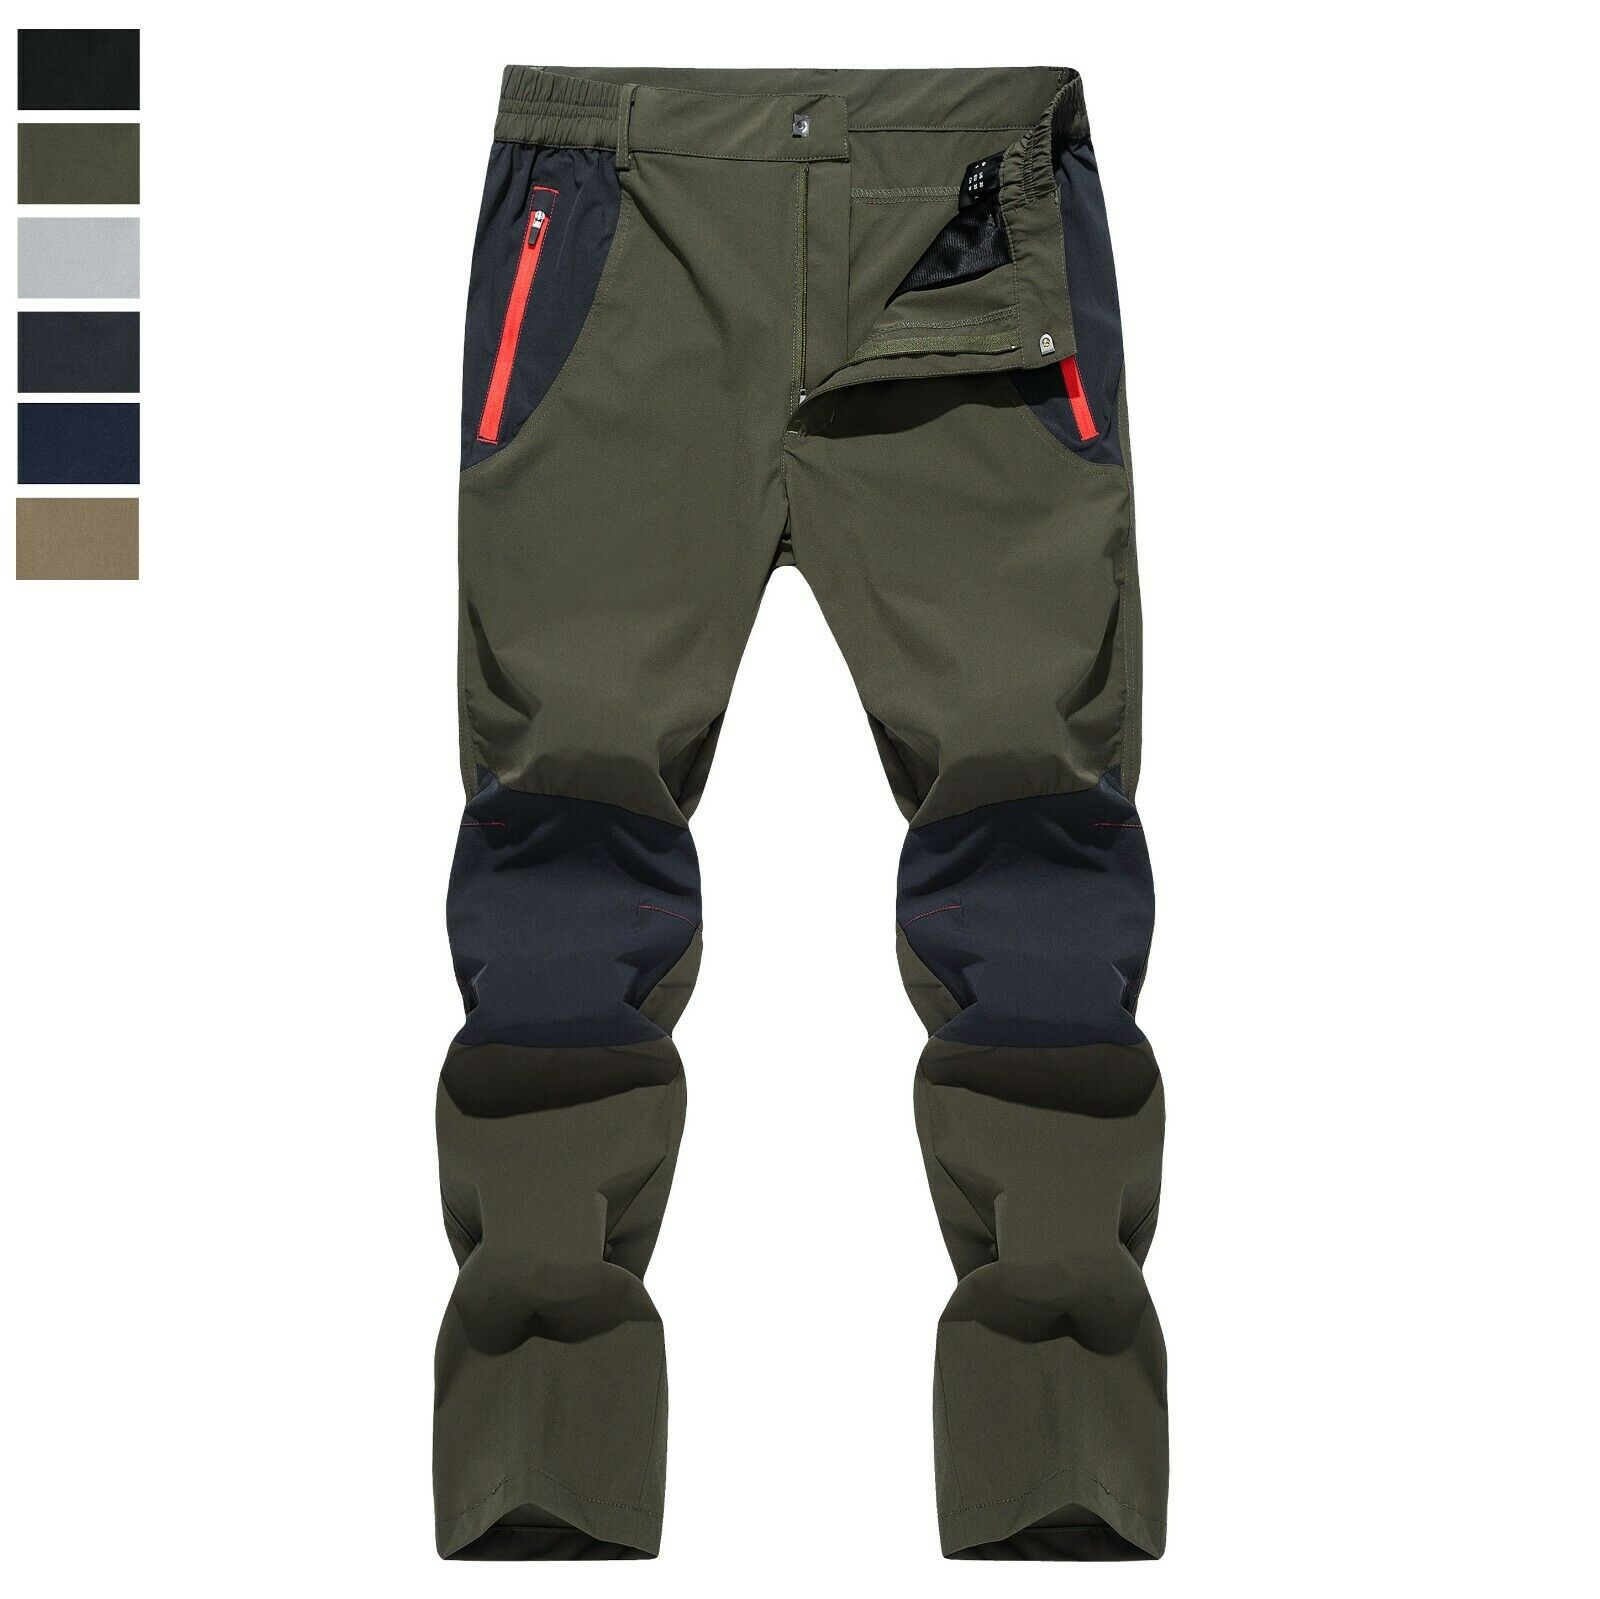 Men's Quick Drying Hiking Pants Lightweight Waterproof Outdo